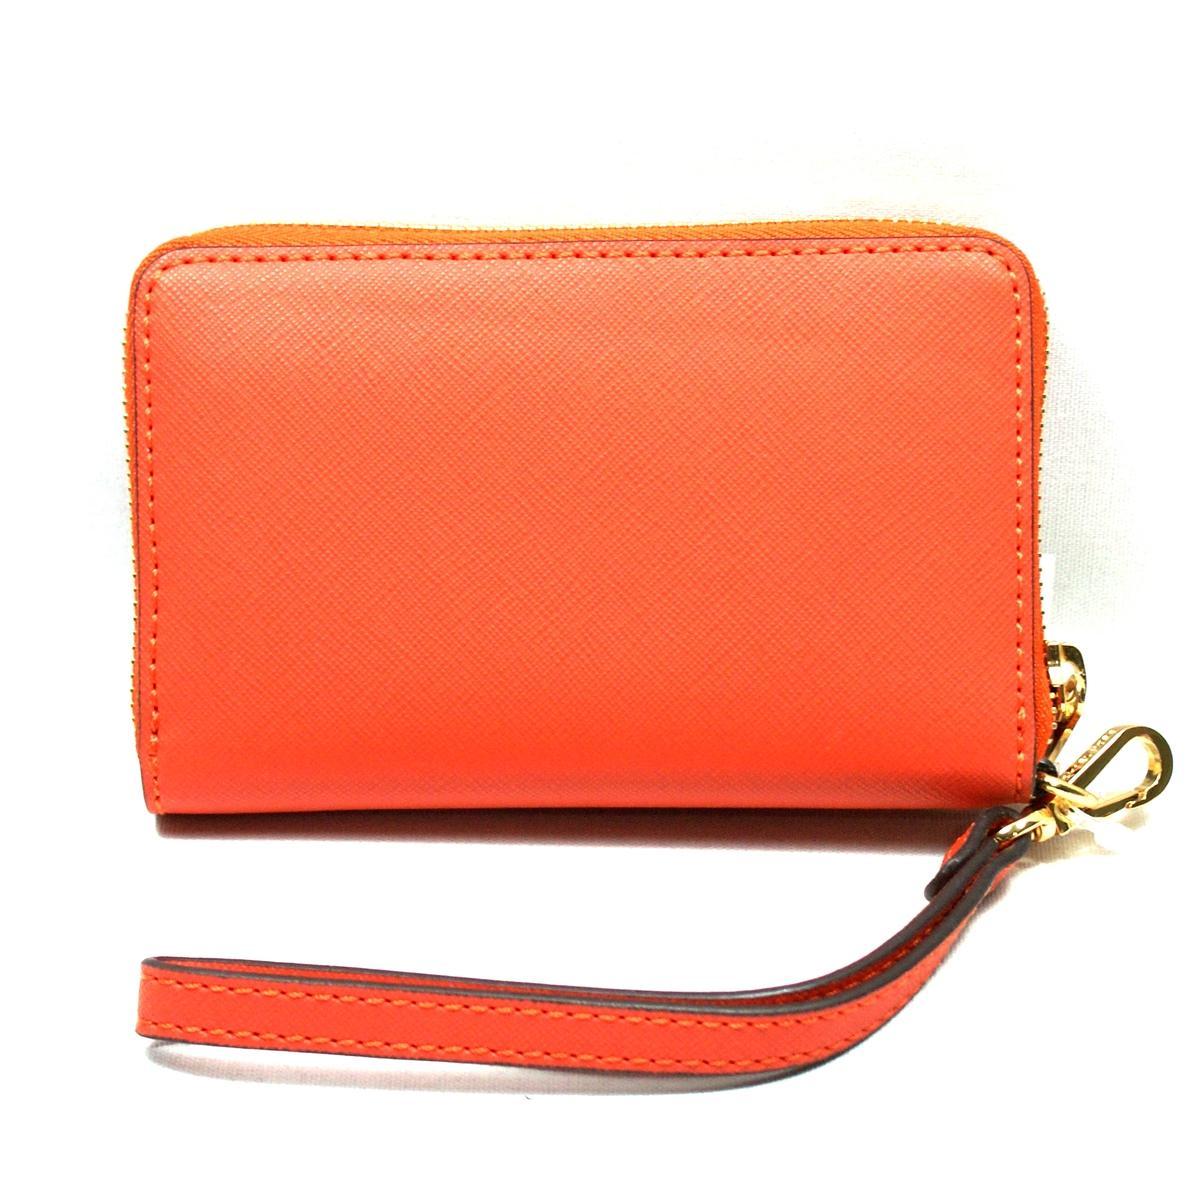 Michael Kors Saffiano Orange iPhone 5 Cases